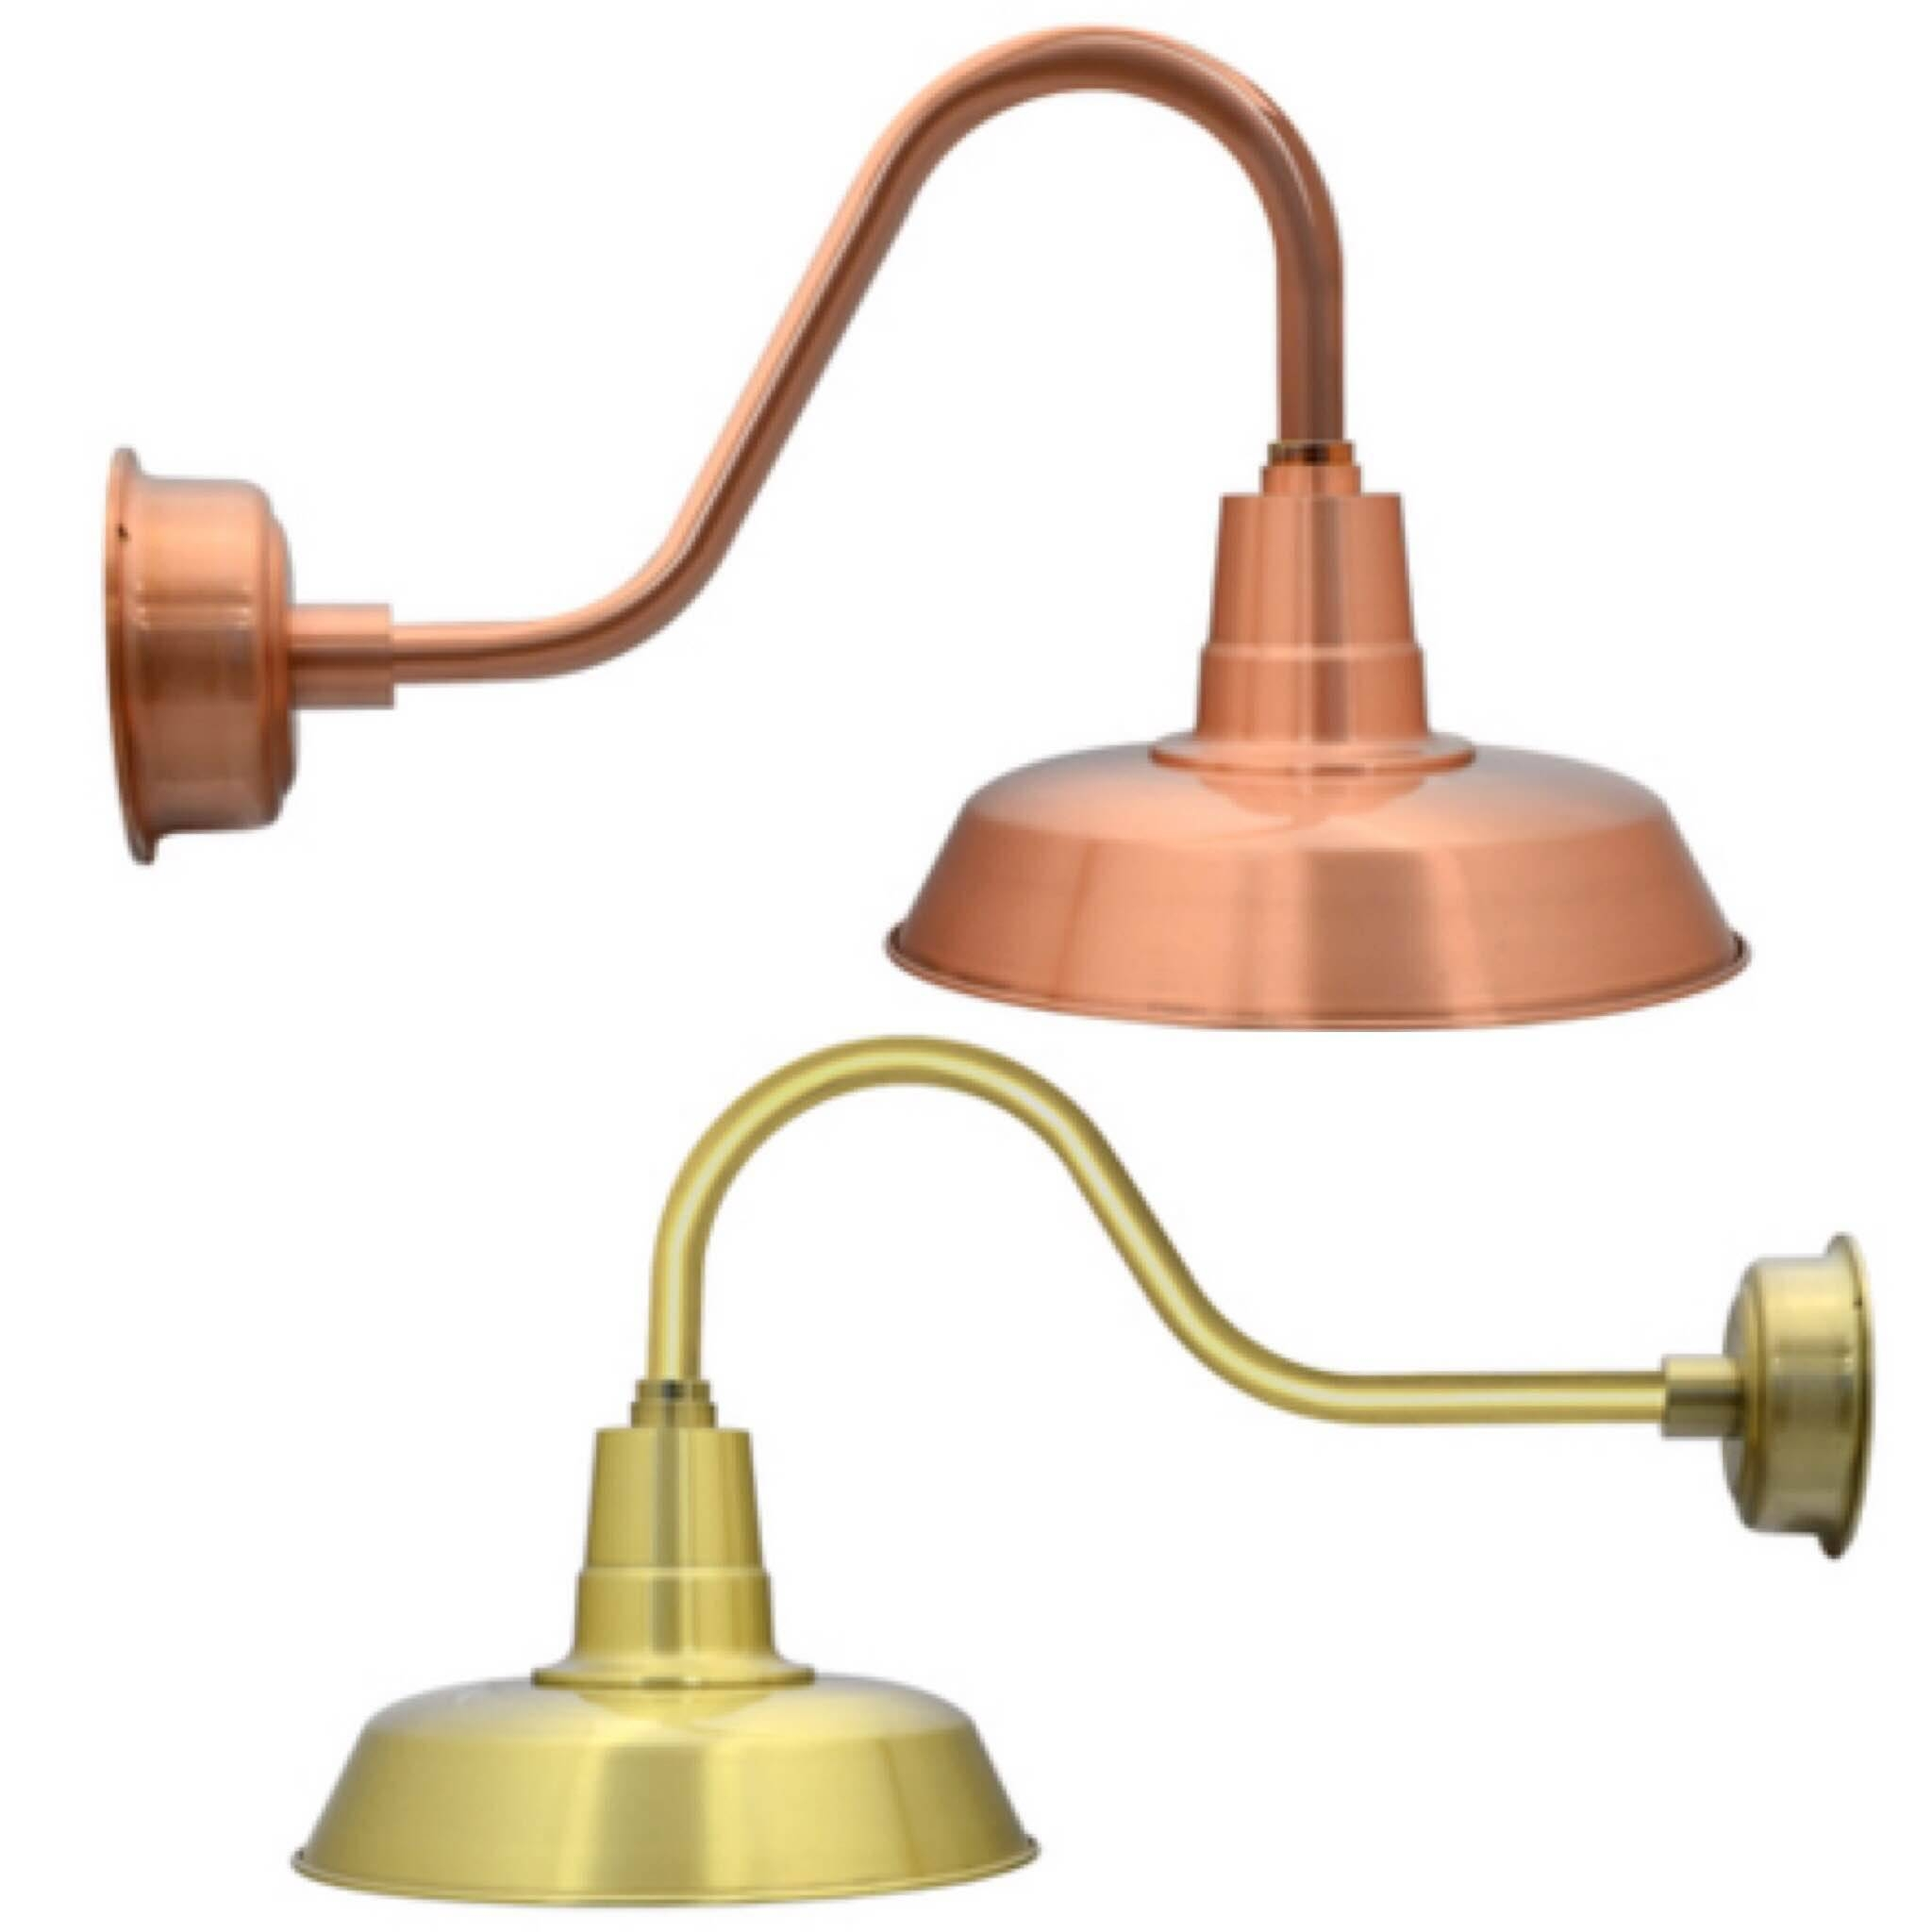 A New Modern Line Of Barn-Style Lighting regarding Barn Lights Uk (Image 2 of 15)